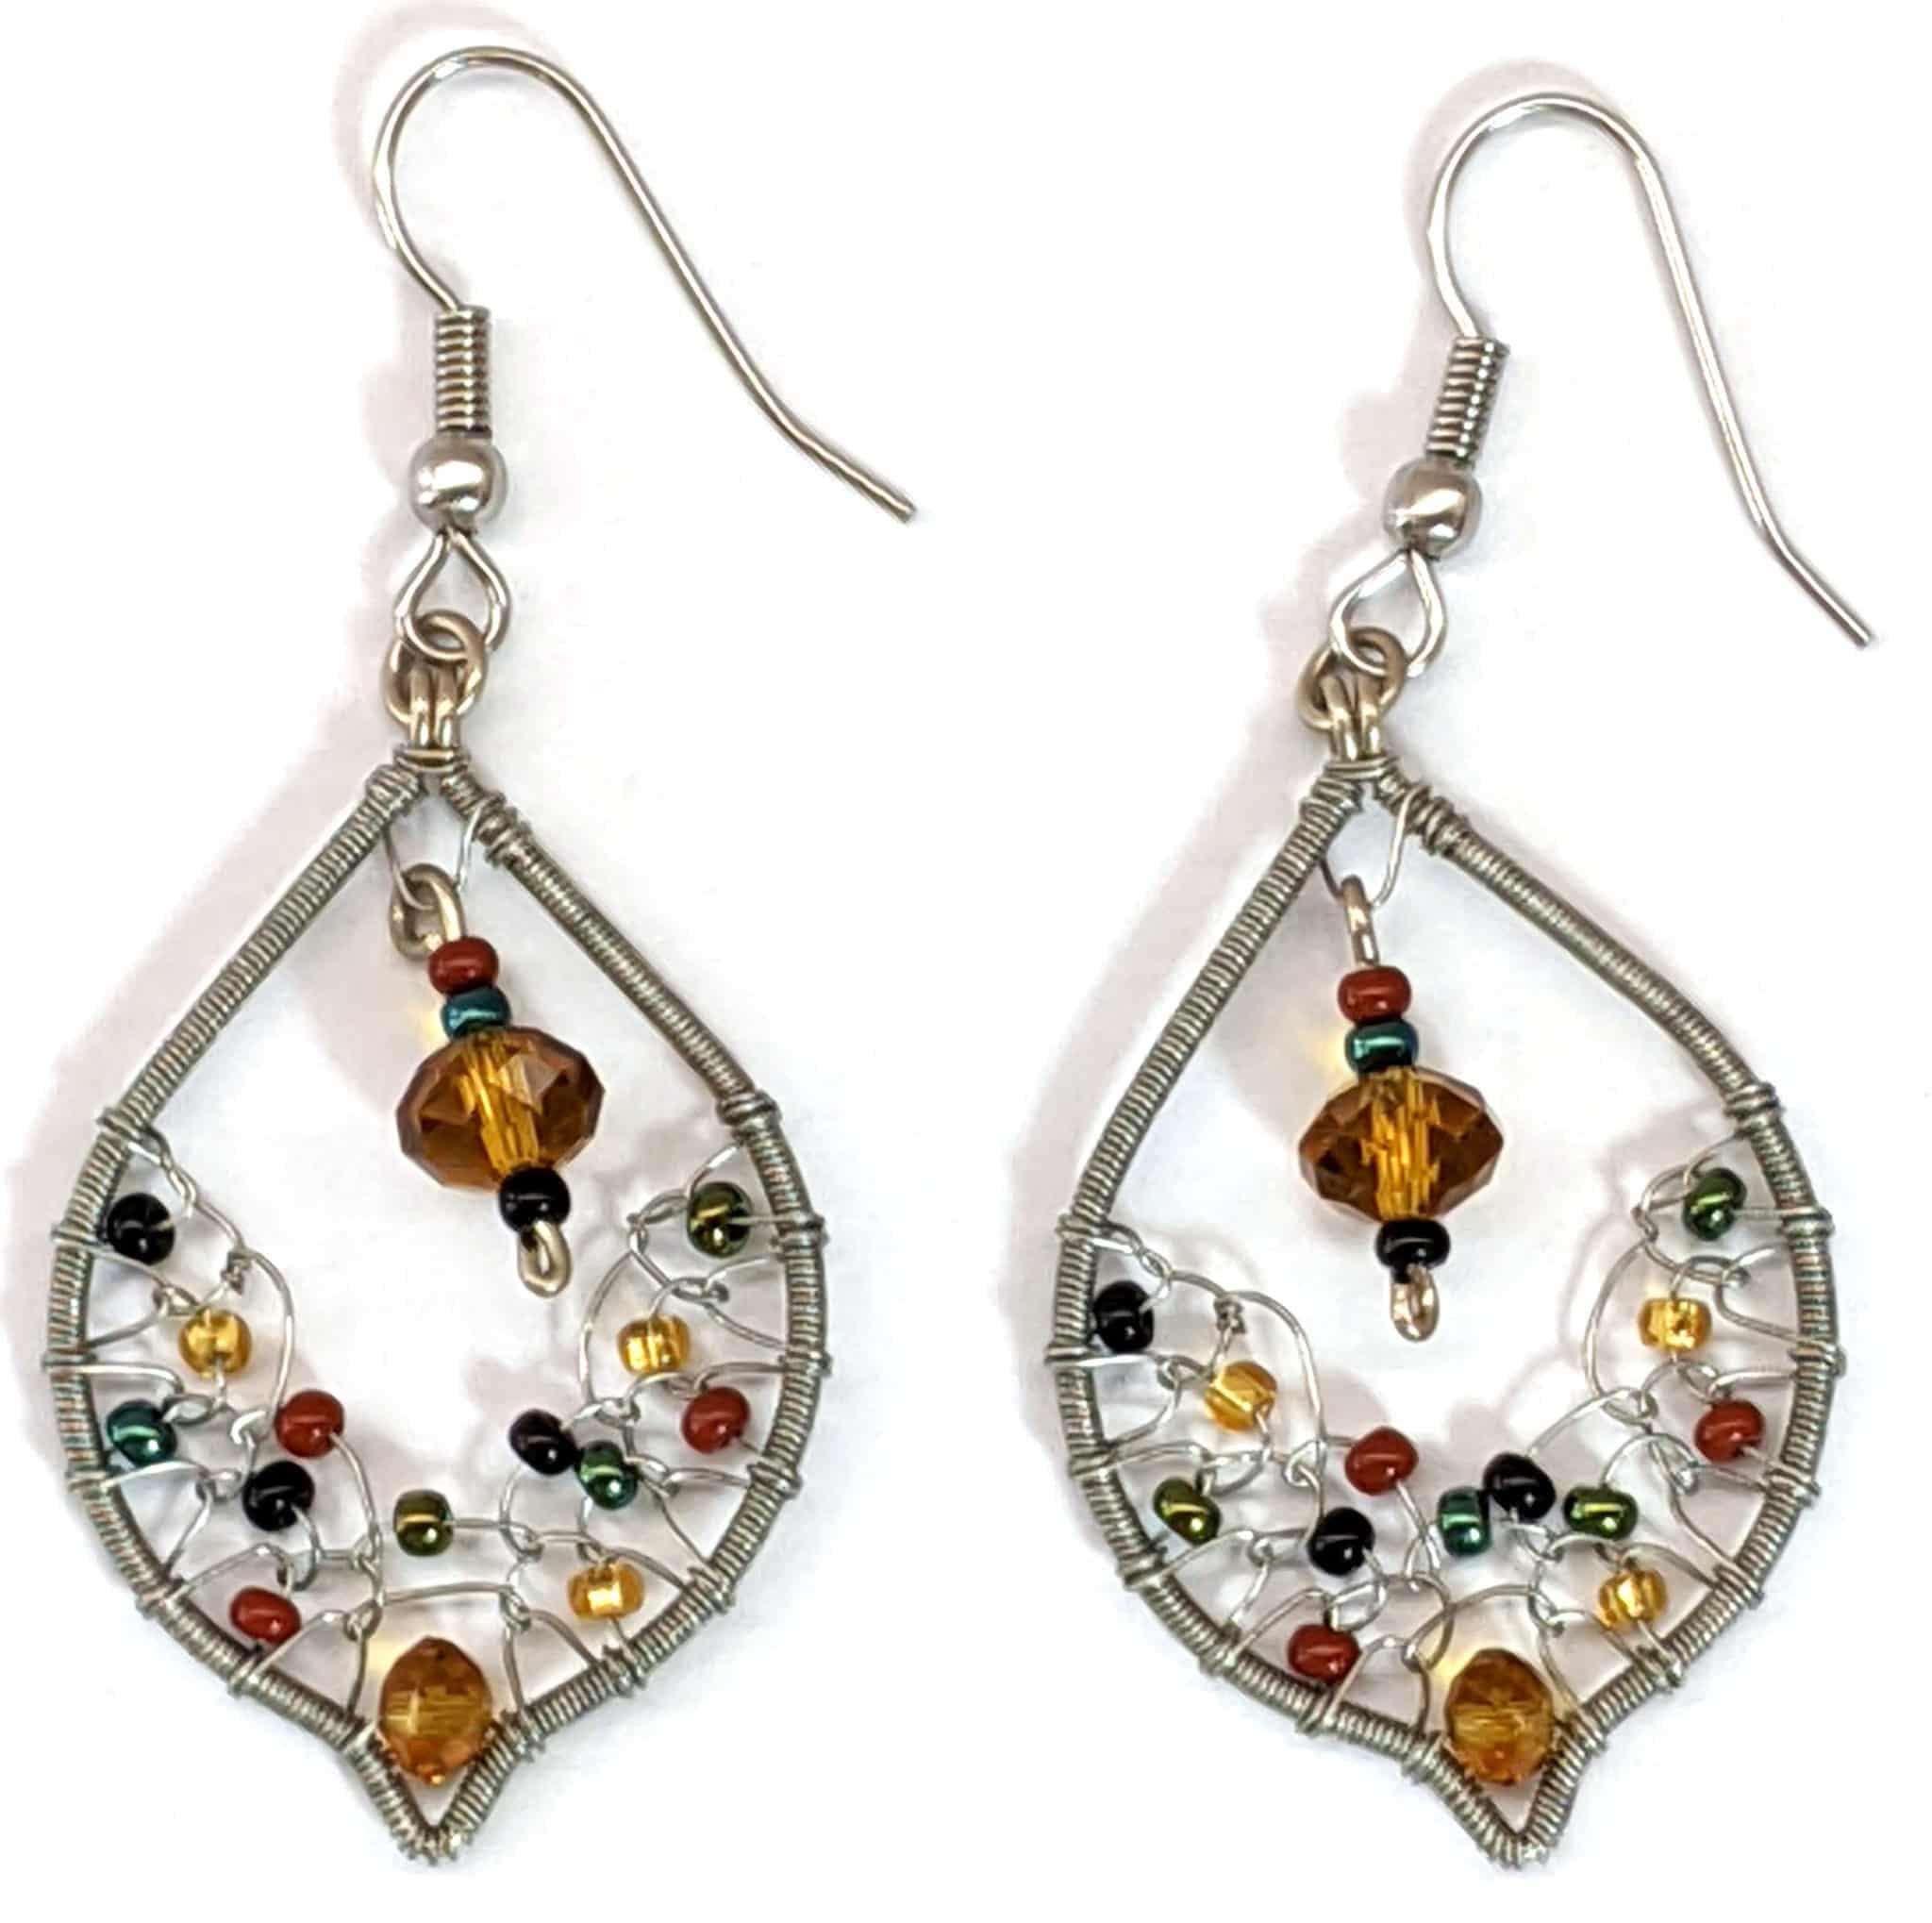 Arabian Nights Earrings - Sophisticated Autumn